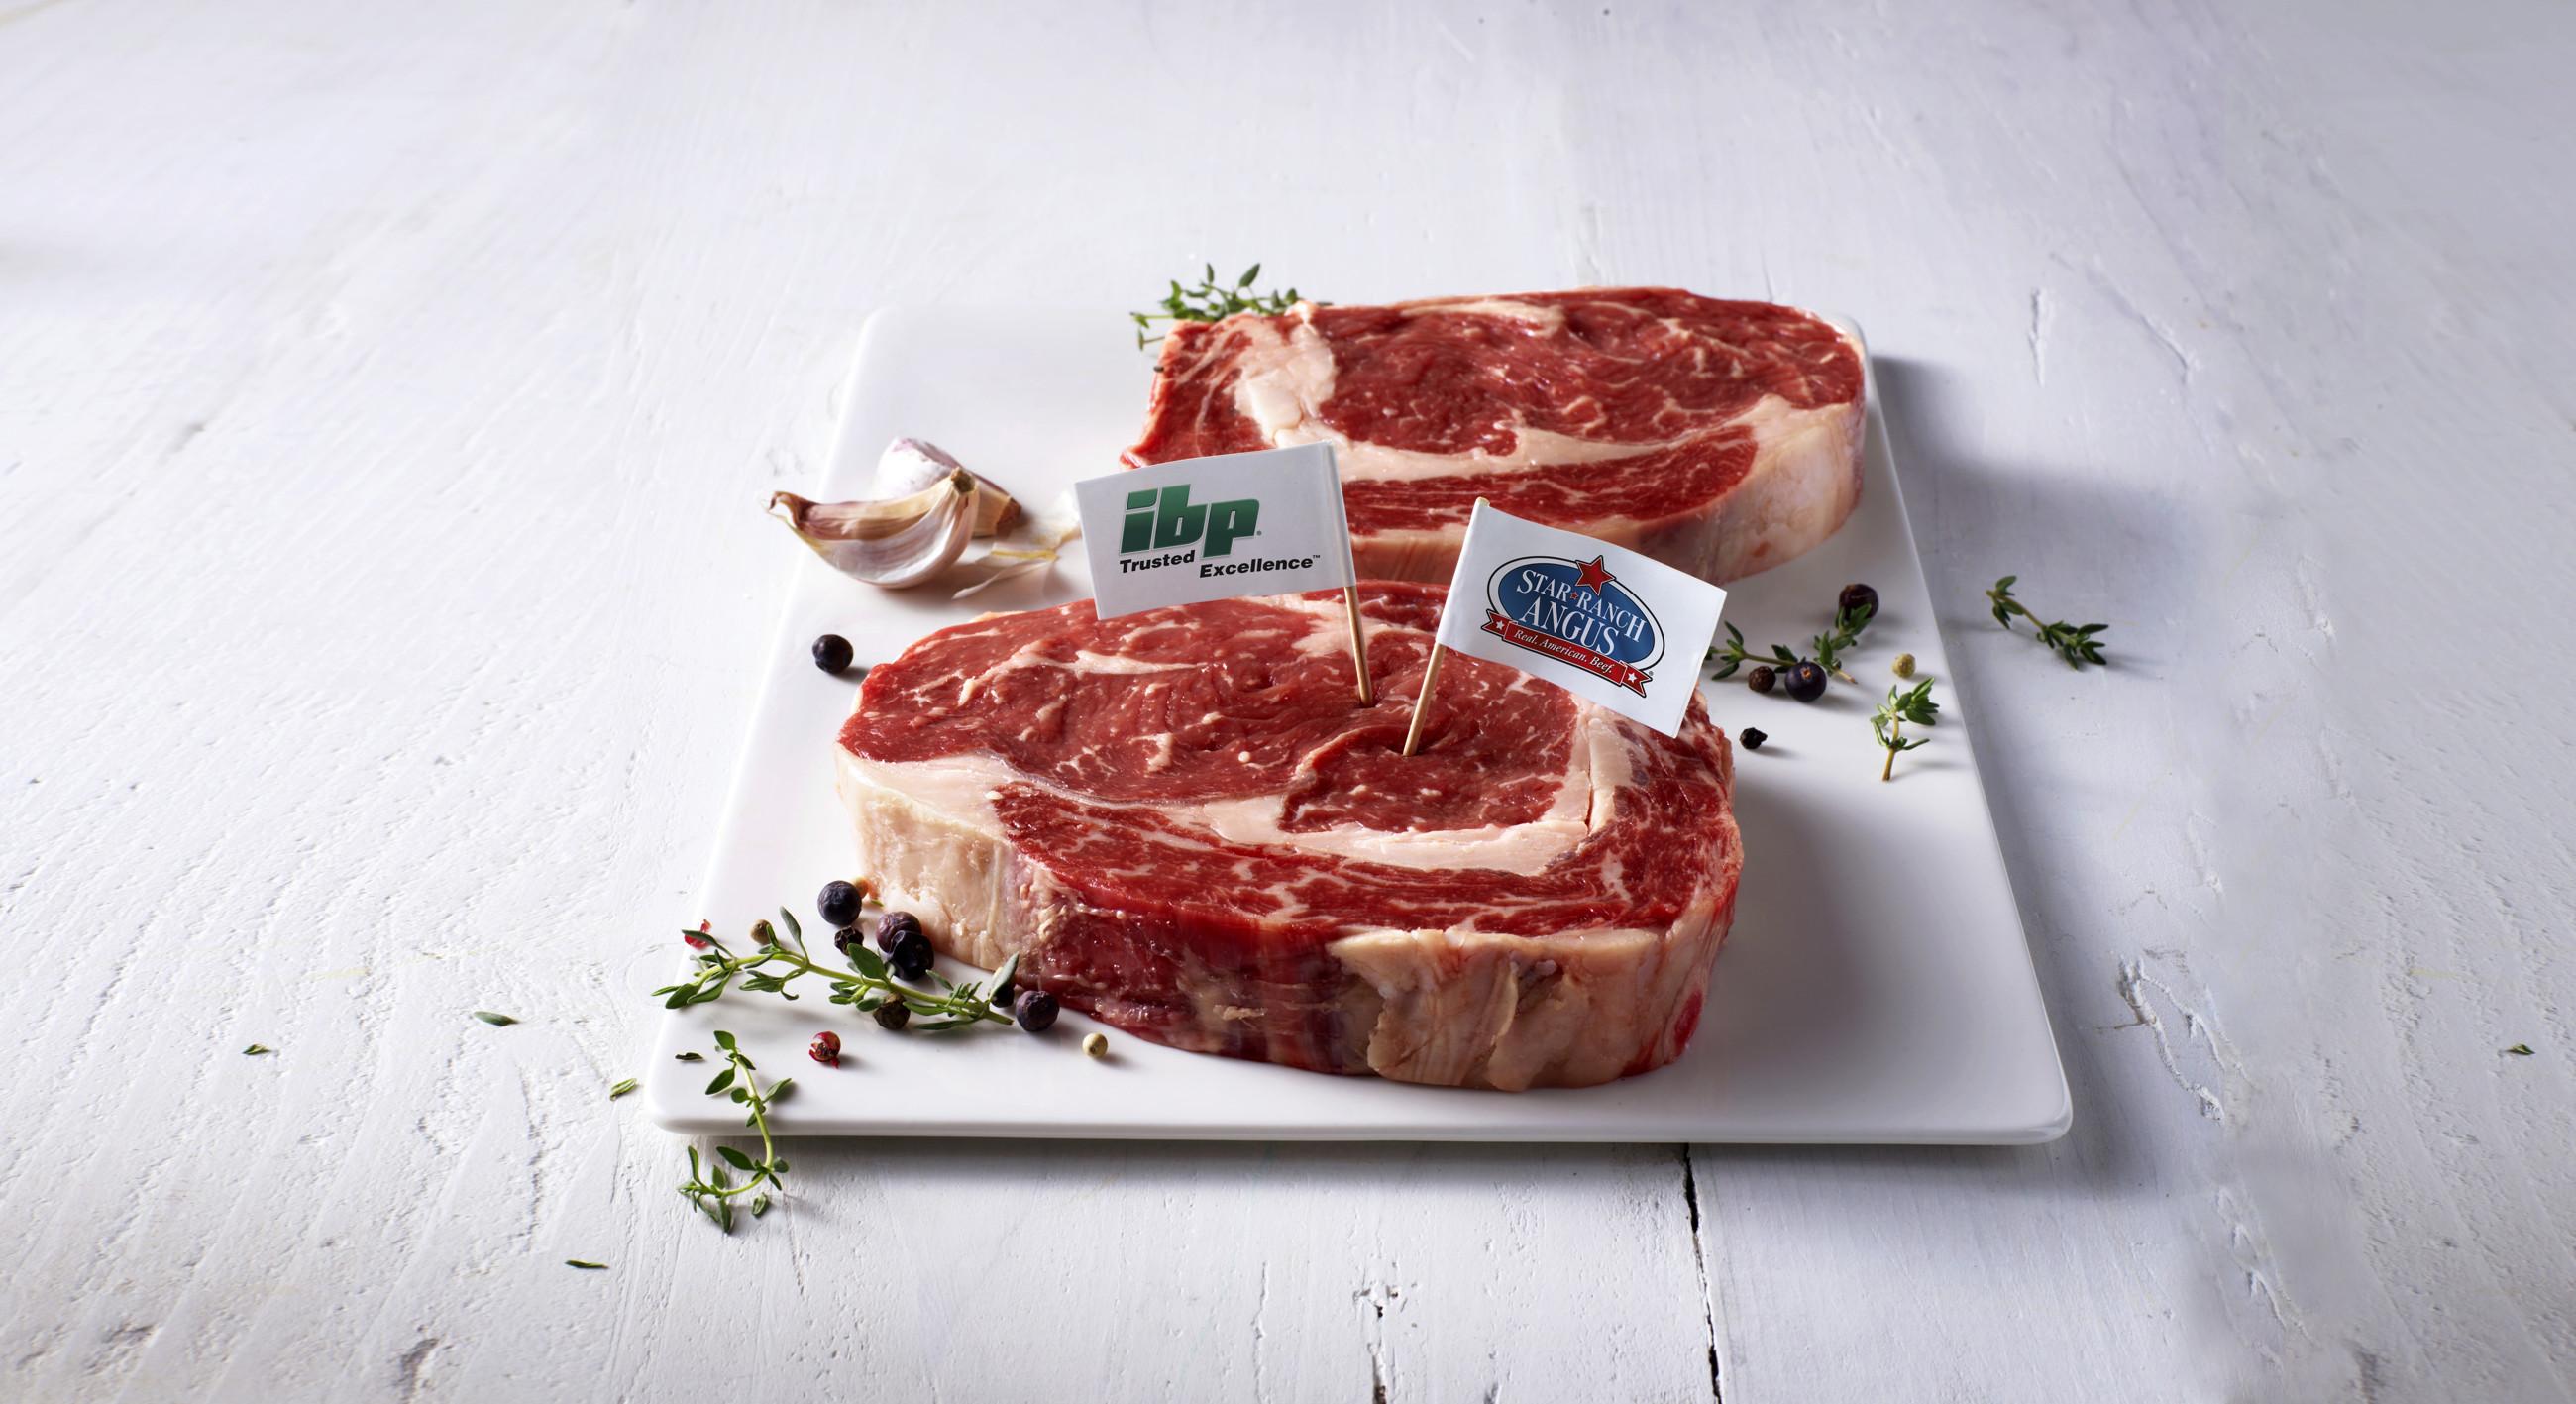 Our exclusive partnerships - Zandbergen World's Finest Meat